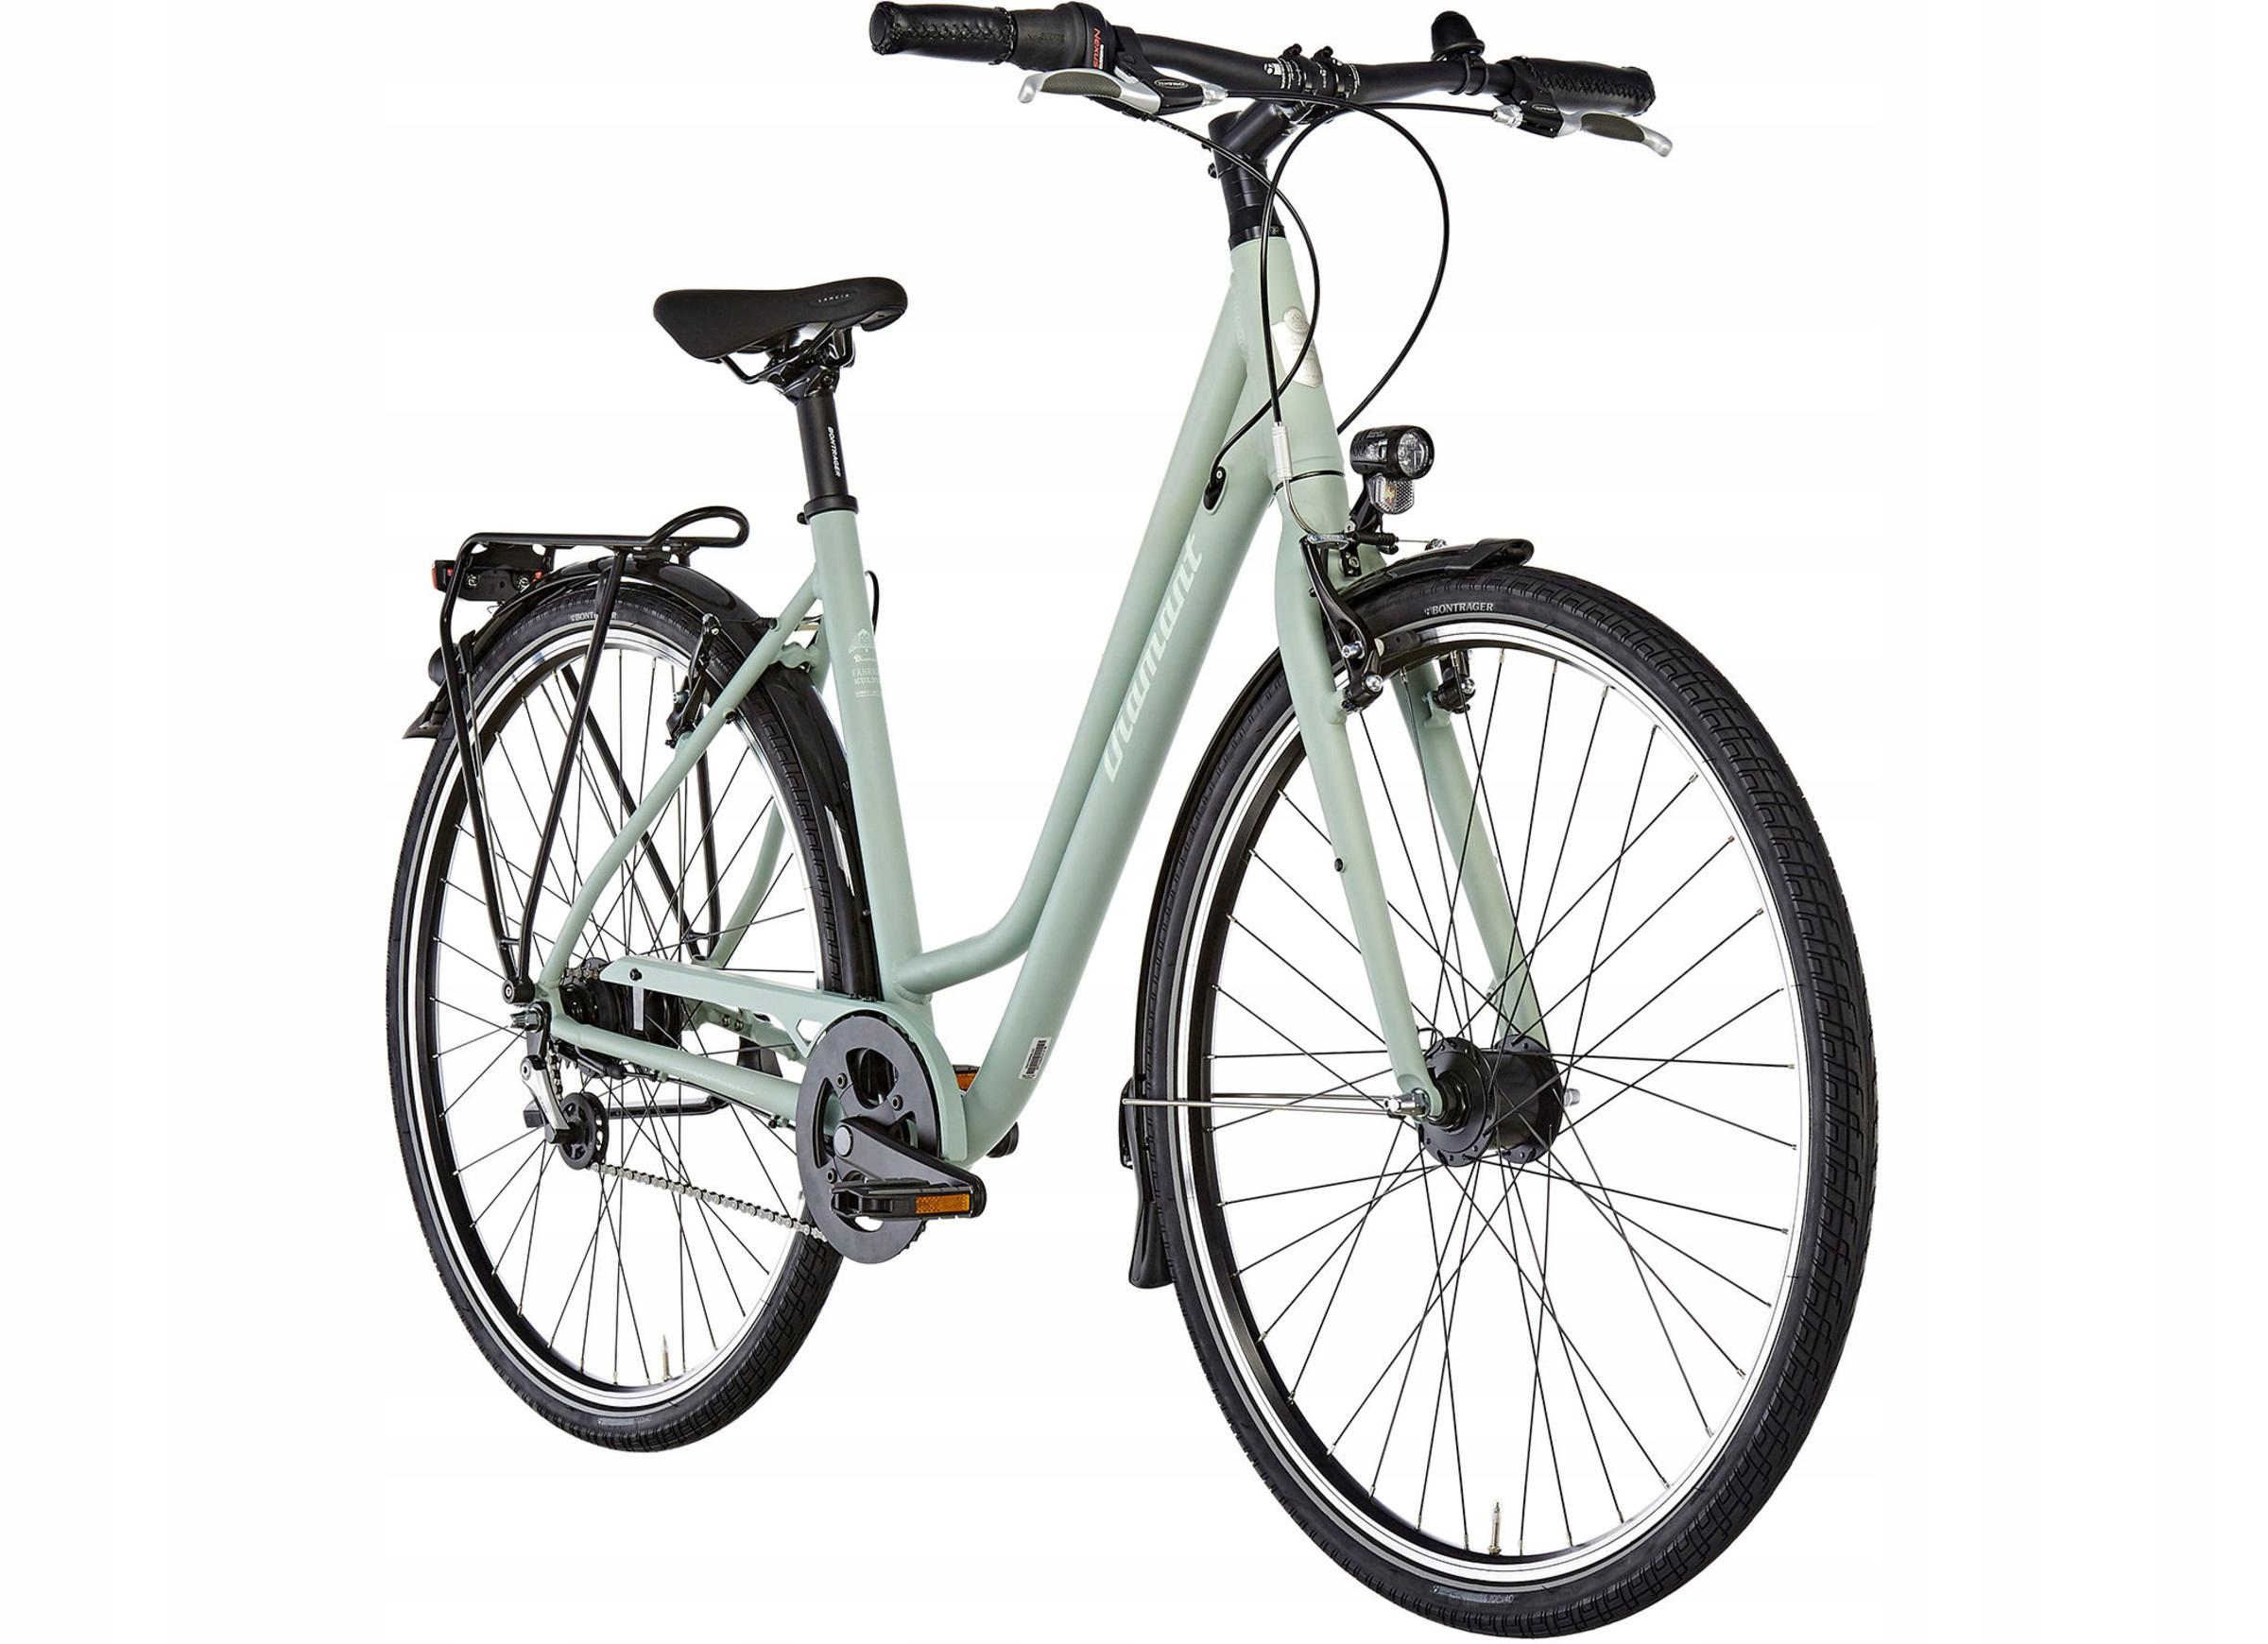 Damka rower trekkingowy DIAMANT 882 nexus nowy3500